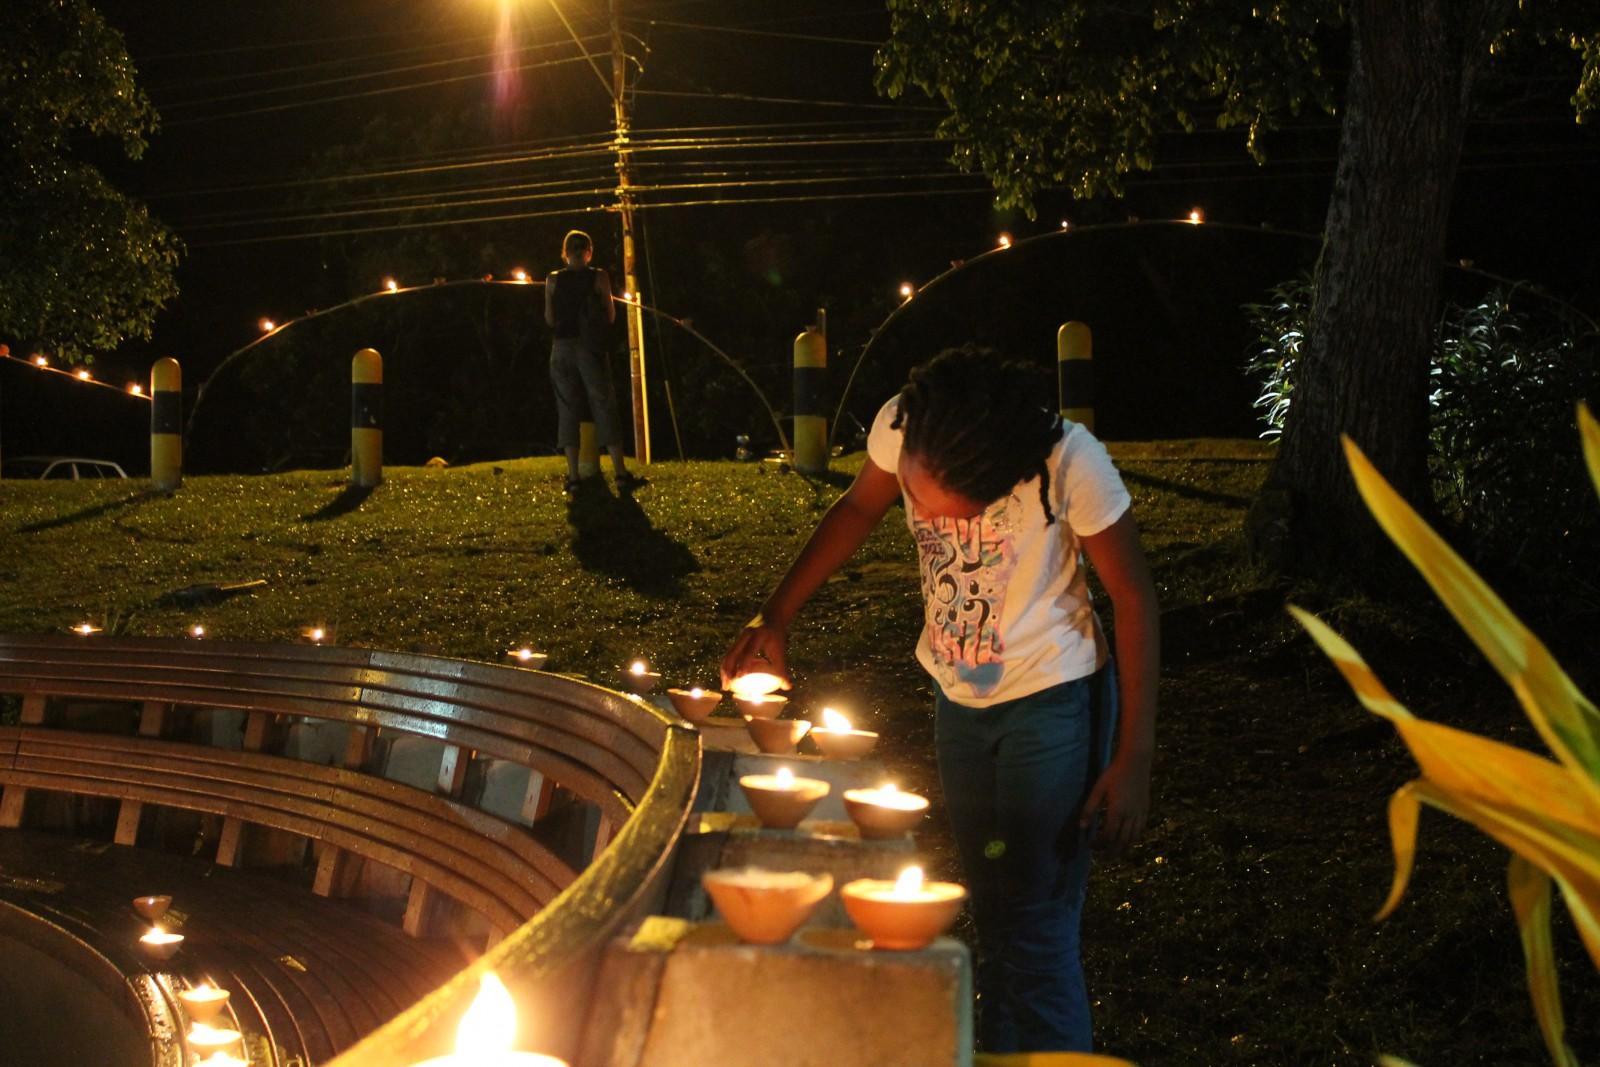 A young girl lights a deya during Divali